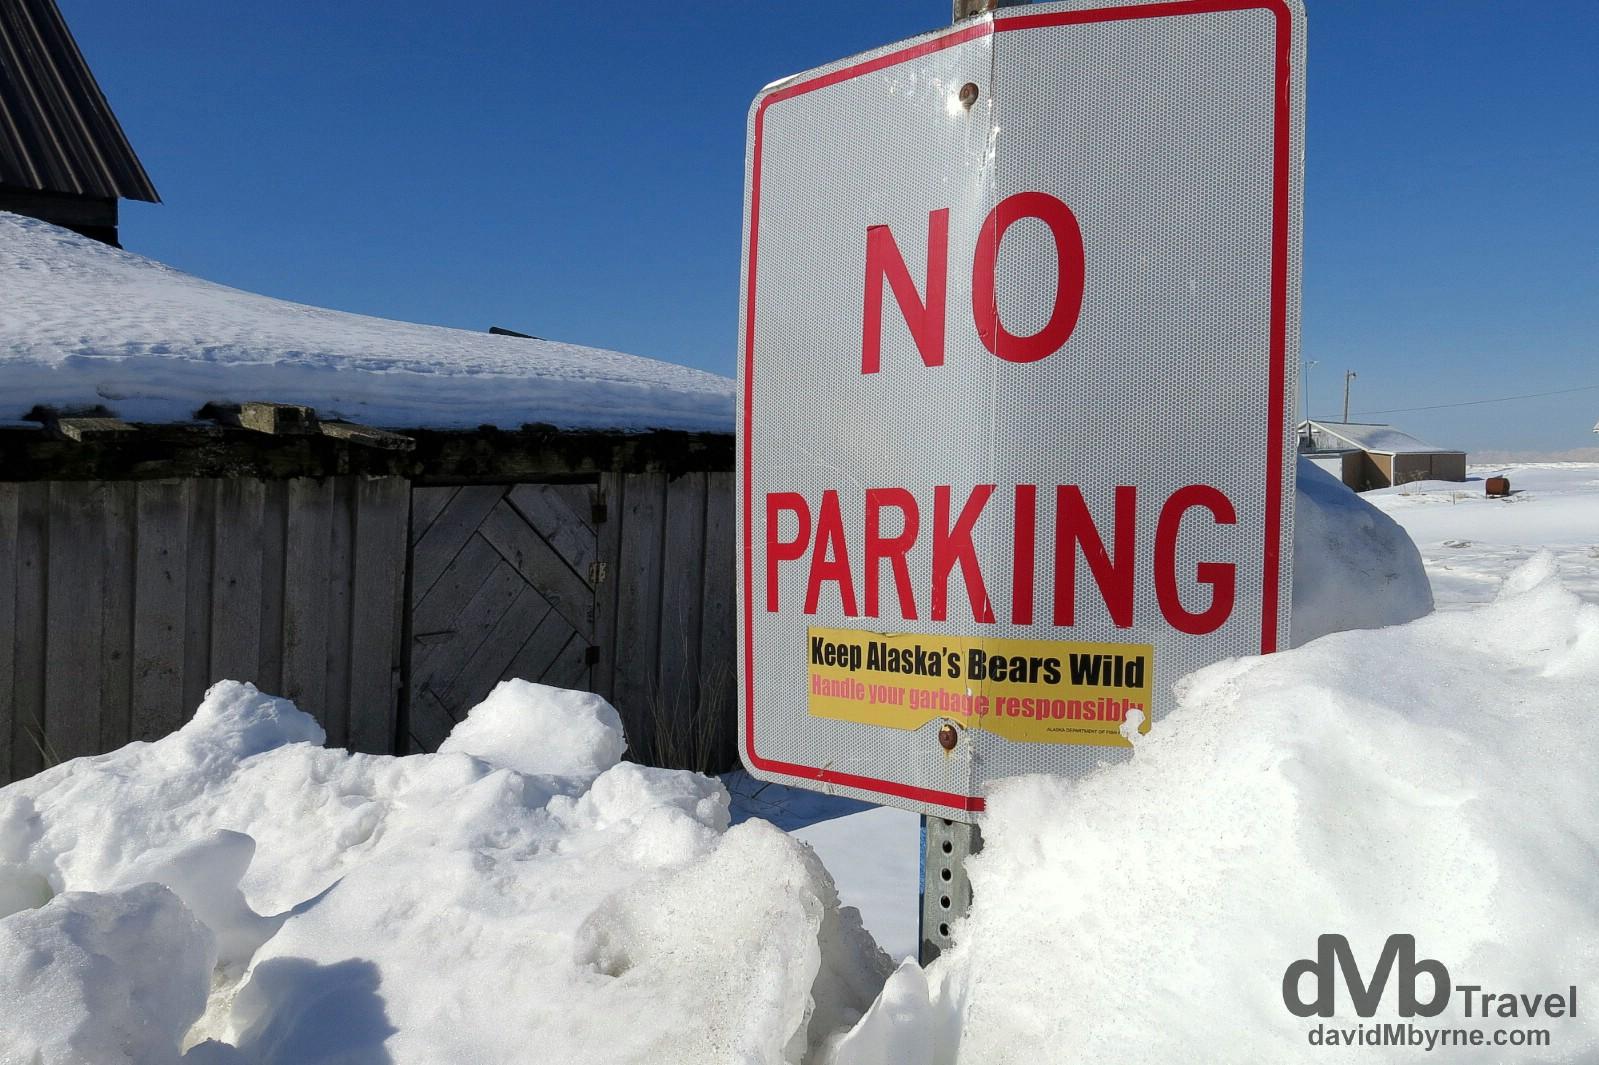 A No Parking sign in the village of Ninilchik on the Kenai Peninsula, Alaska, USA. March 18th 2013.